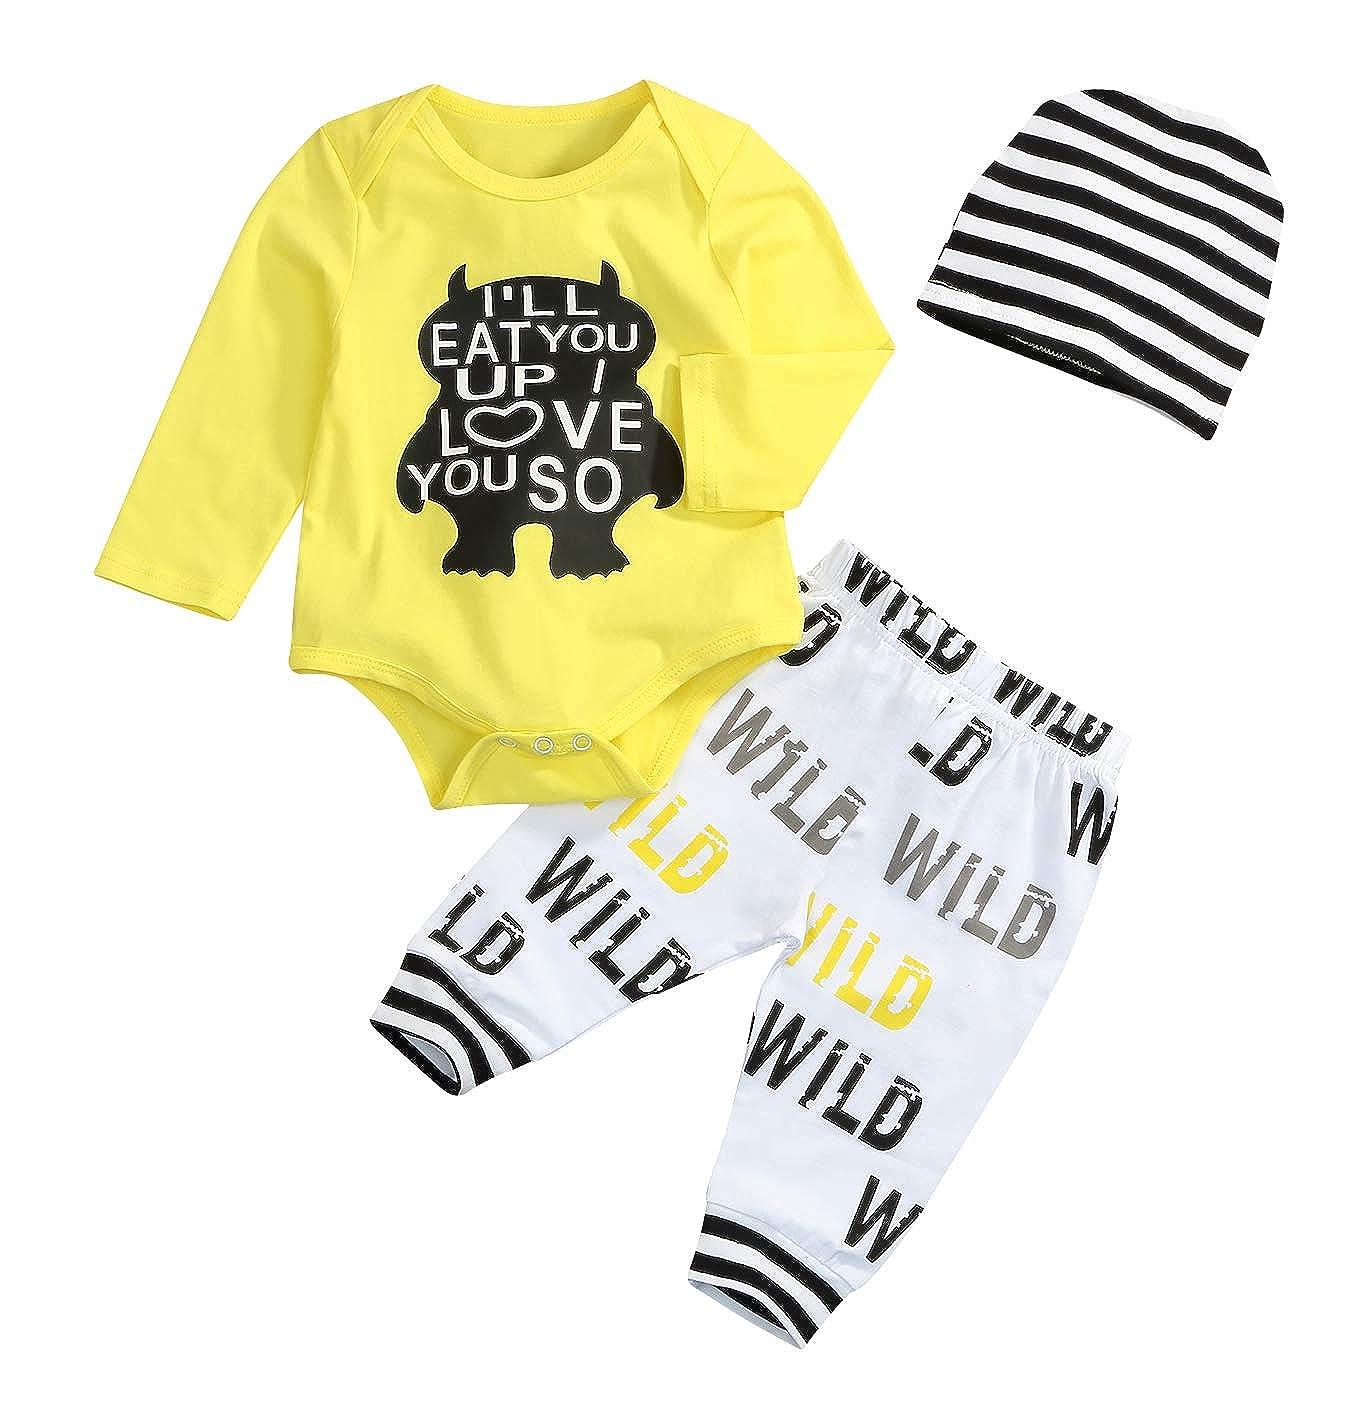 2cb3c7b93f7c3 Toddler Baby Boy Monster Cartoon Letter Sleeve Summer Short Sleeve Jumpsuit  Tops Pants Clothes Set